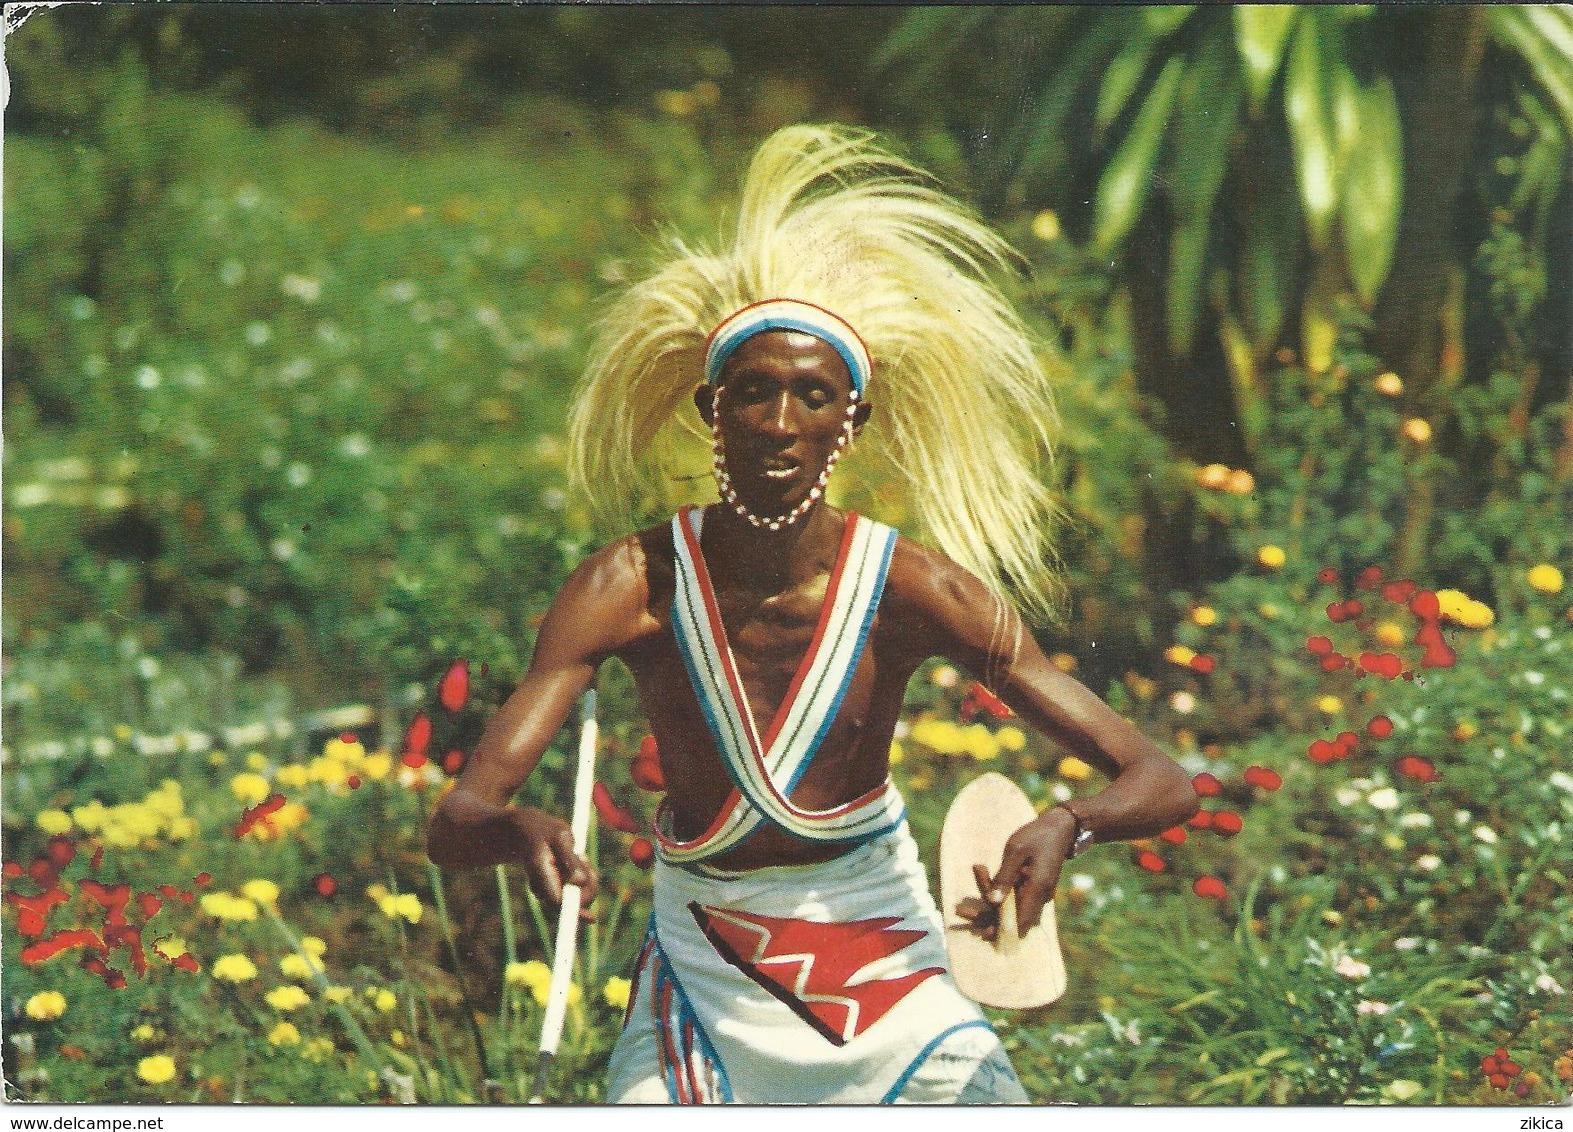 REPUBLIQUE DEMOCRATIQUE DU CONGO - Goma - Danseur - Folklore - Congo - Kinshasa (ex Zaire)